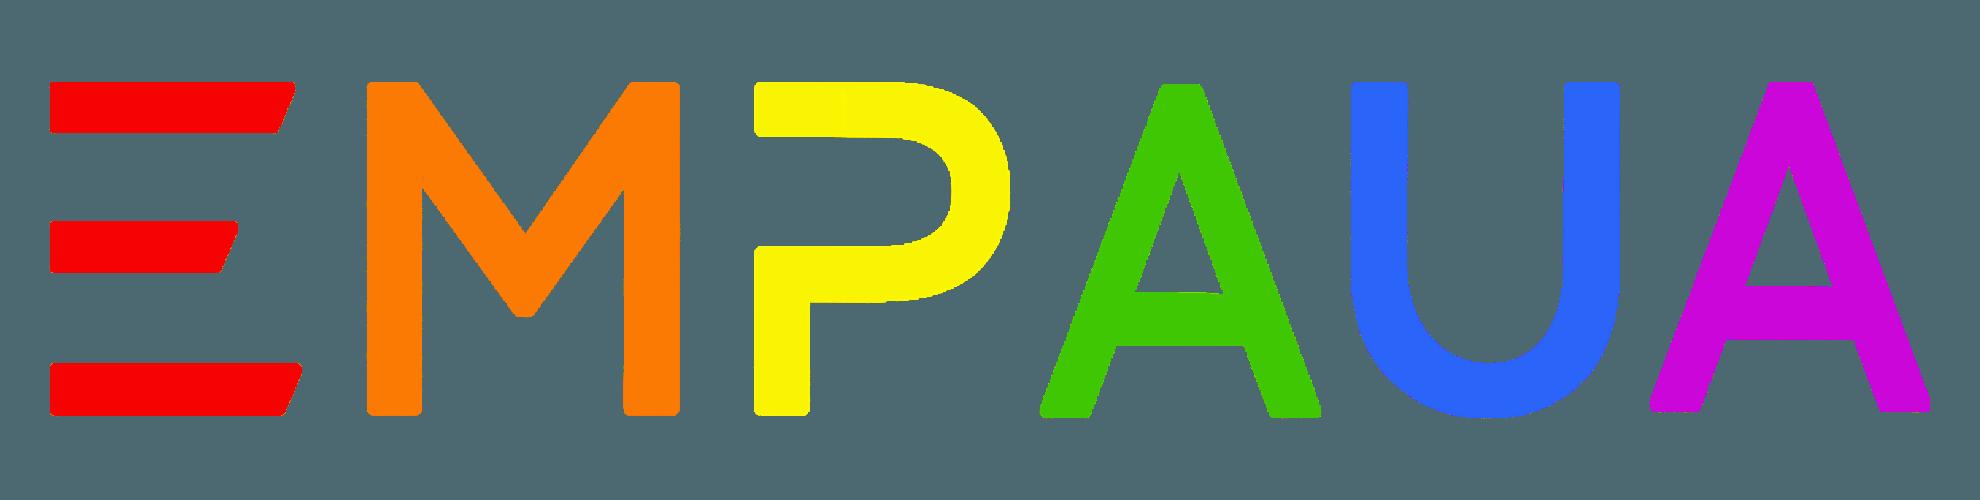 EMPAUA_pride logo_1920x1080 px (PDF)